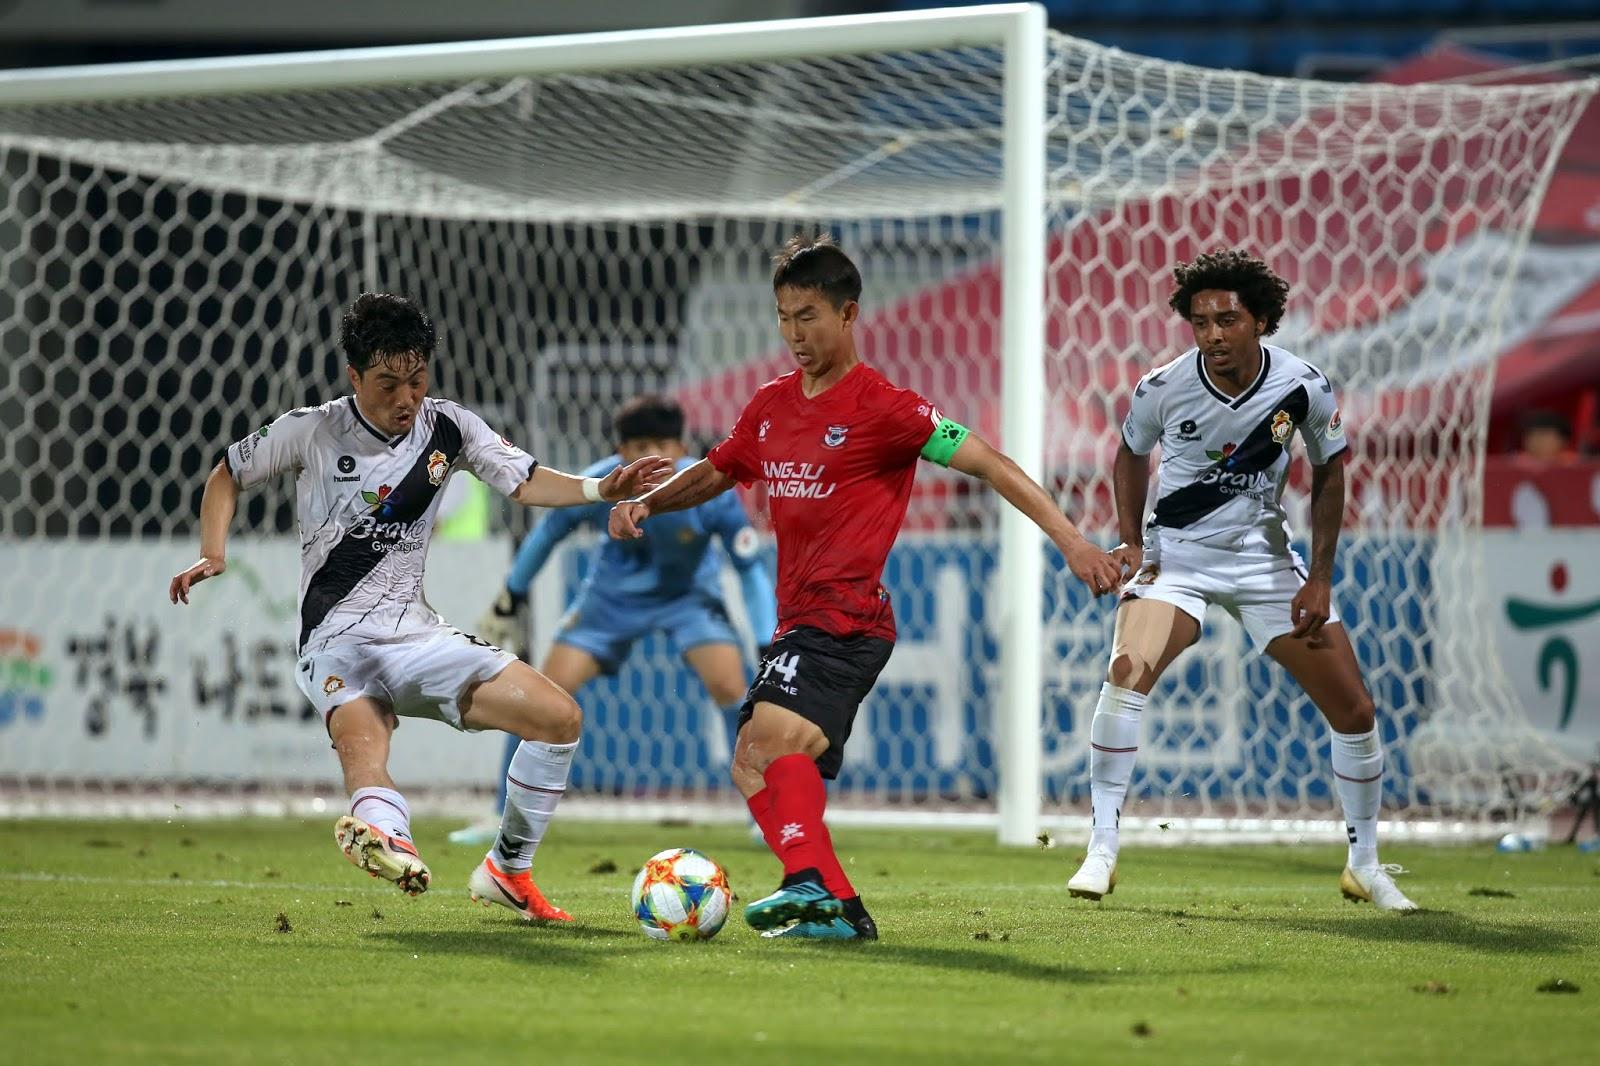 Yoon Bit-garam vs Gyeongnam FC 08.03.19